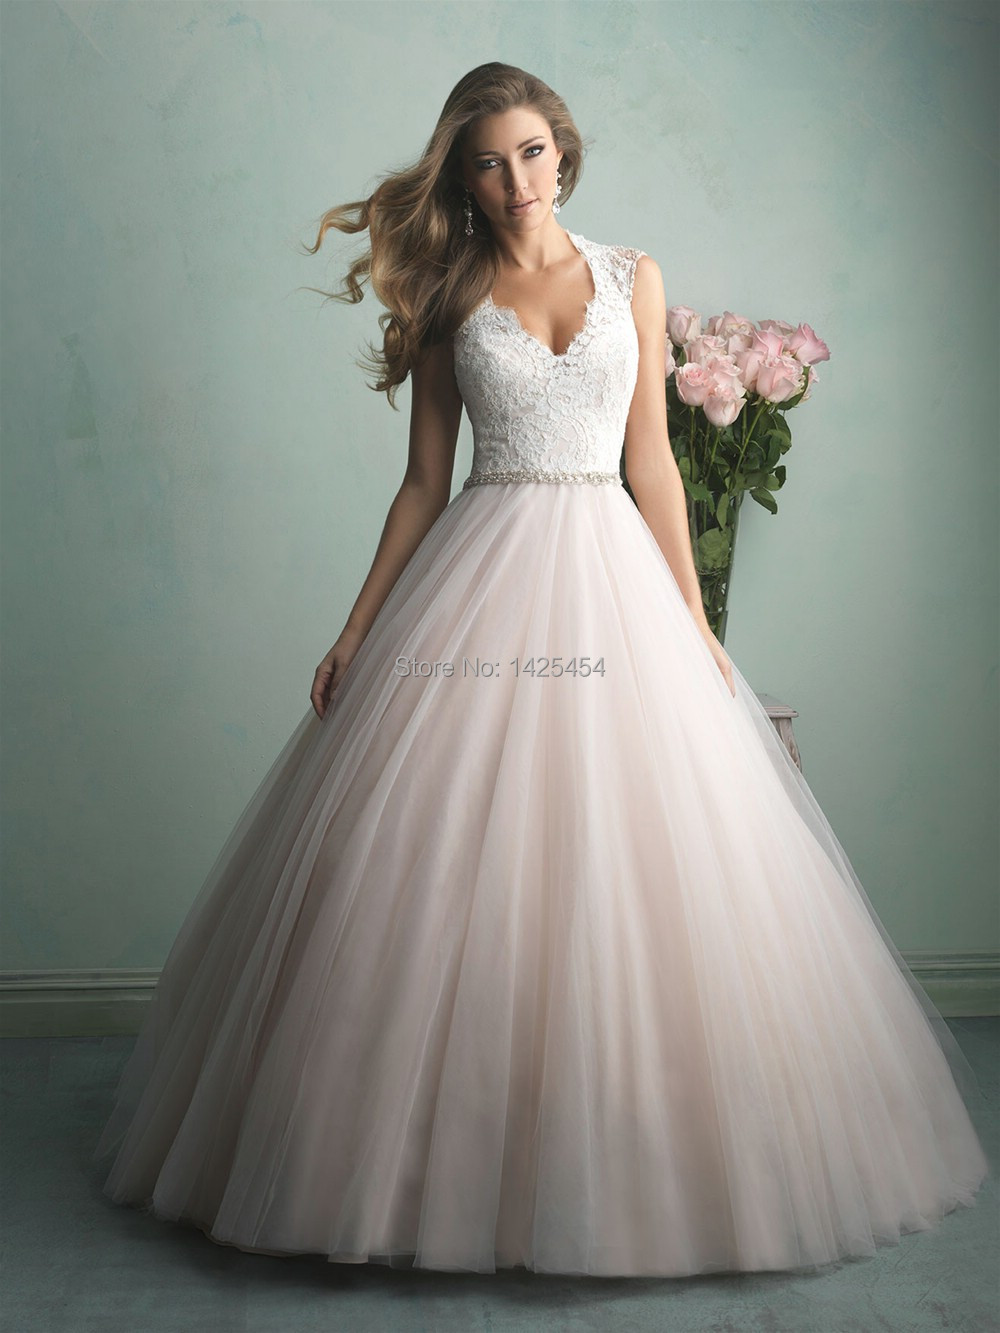 designer lace ball gown wedding dress « Bella Forte Glass Studio